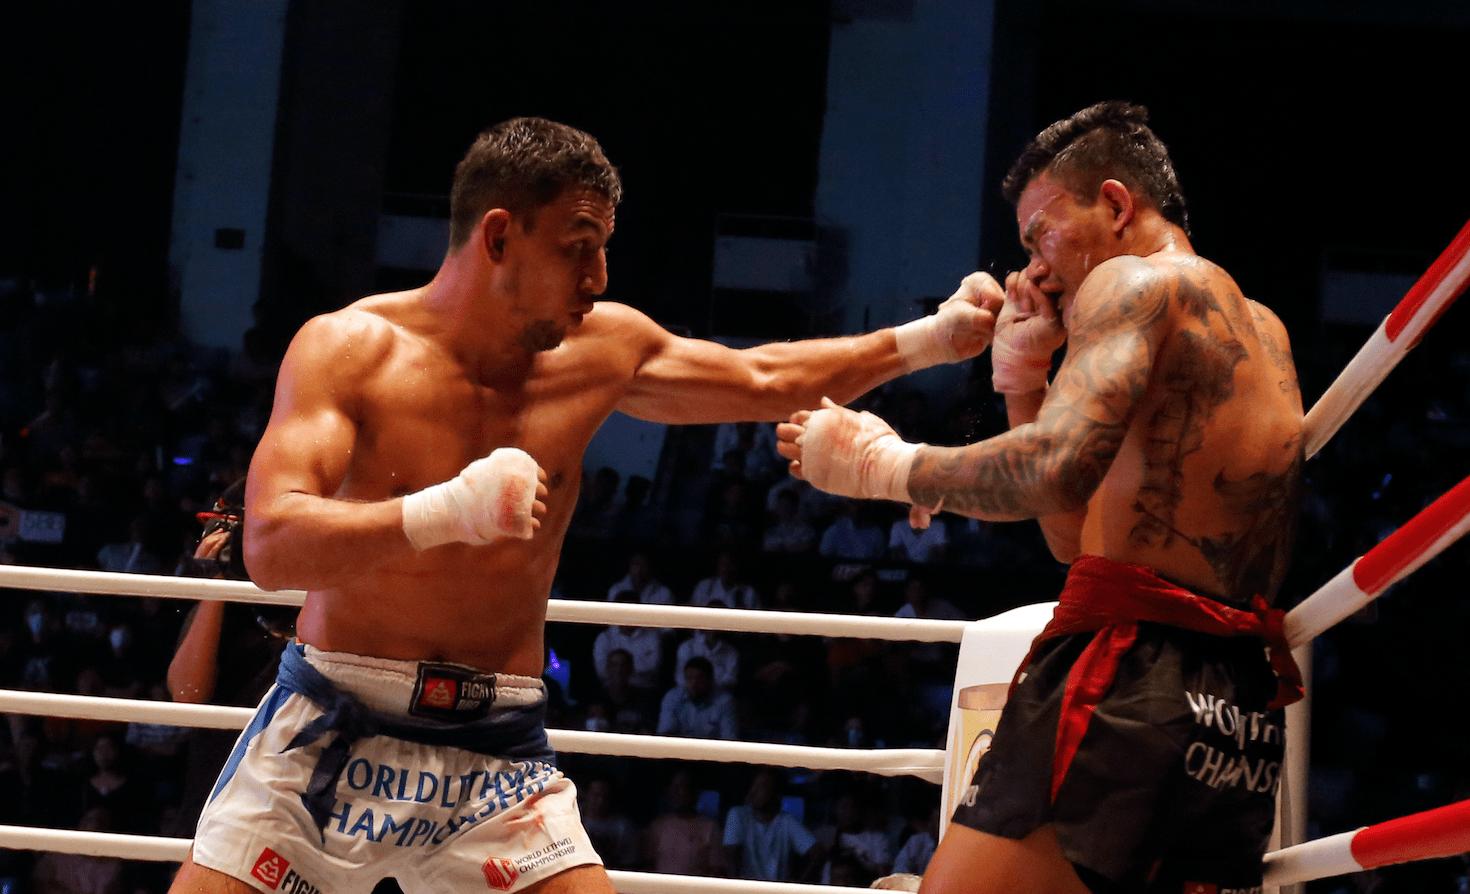 WLC: Battlebones – Naimjon Tuhtaboyev Wins Middleweight Title